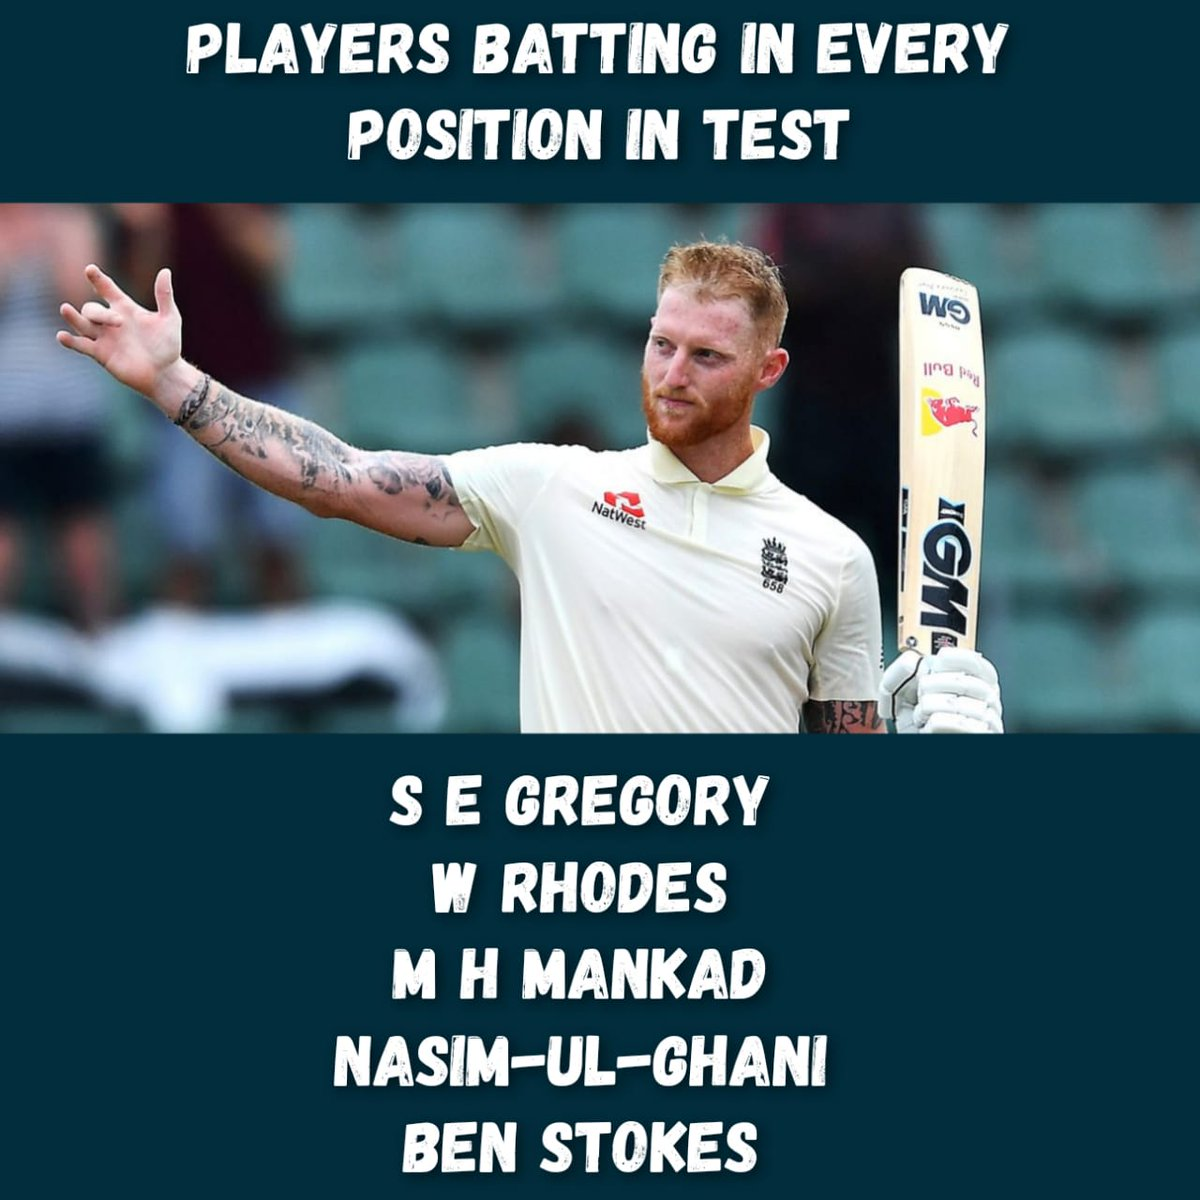 Players Batting in Every Position in Test  #joeroot #viratkohli #rohitsharma #benstokes #jaspritbumrah #rishabhpant #ravindrajadeja #jadeja #shubmangill #ajinkyarahane #kohli #bumrah #starc #engvind #indveng #cricket #cricketmerijaan #cricketlover #teamindia #benstokes